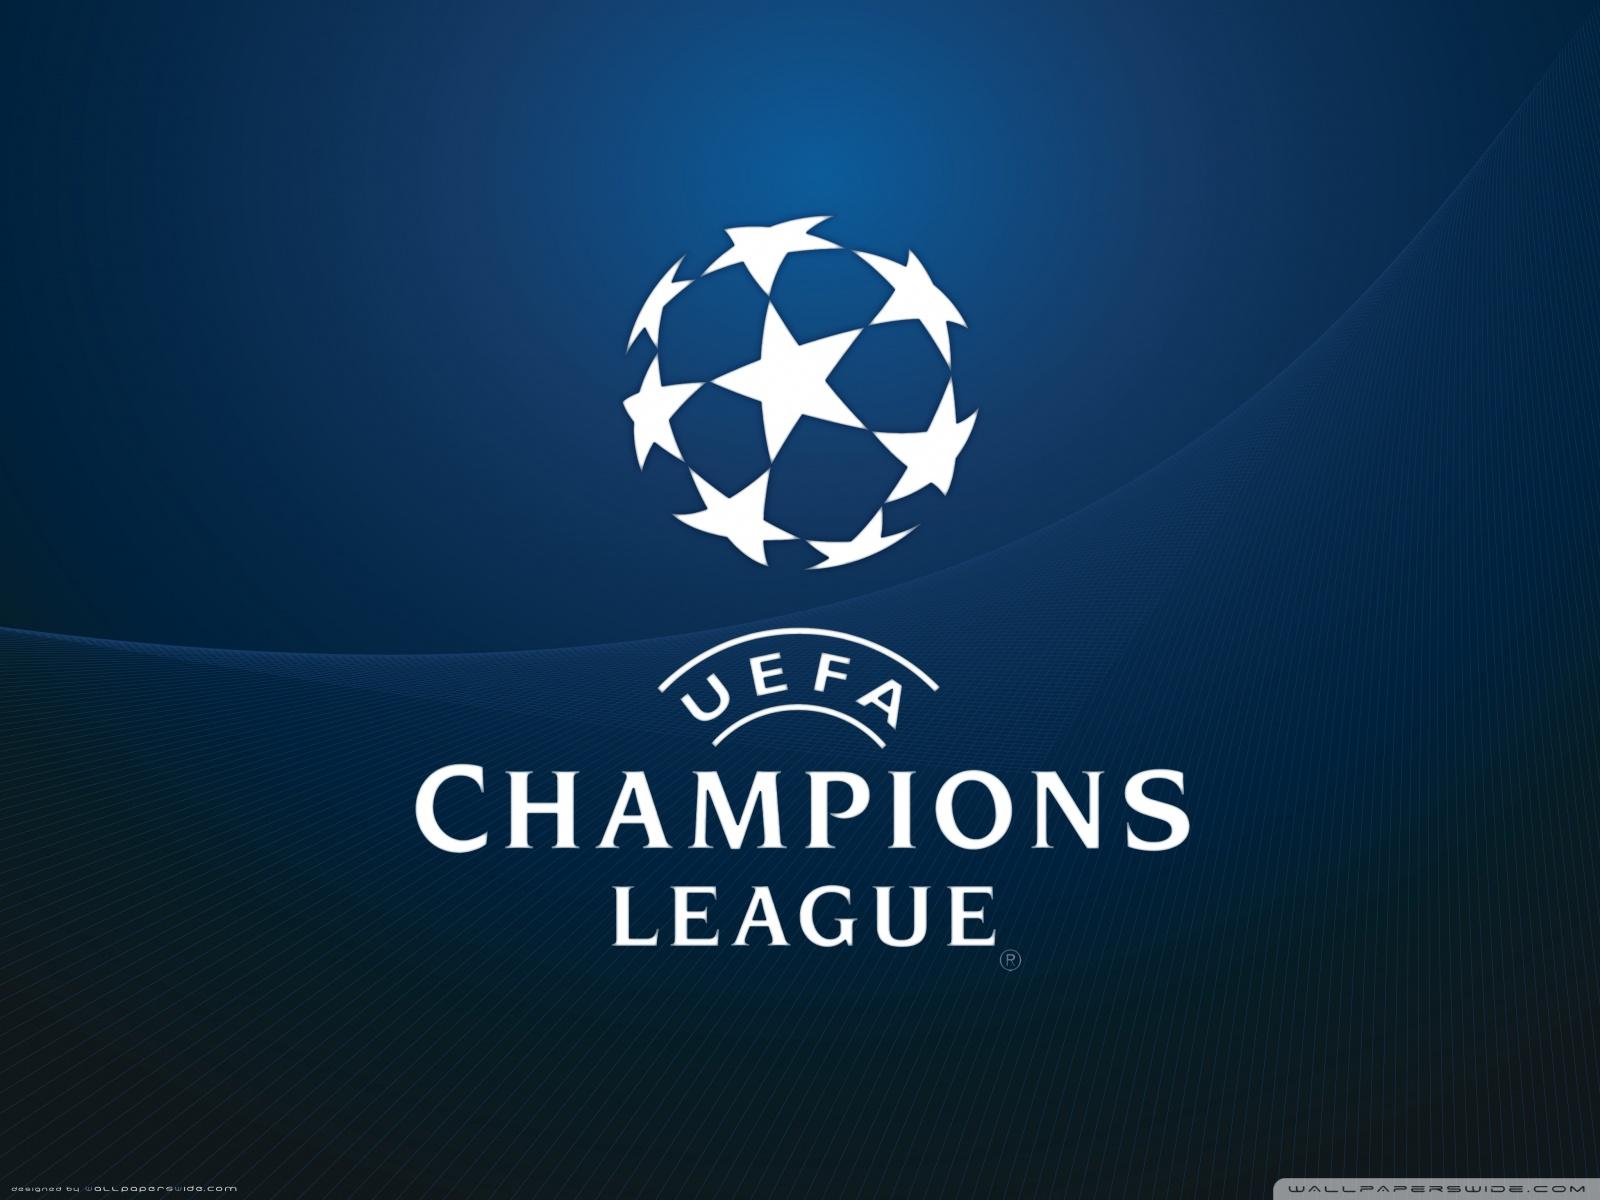 Uefa Champions League wallpaper champions league Wallpapereorg 1600x1200